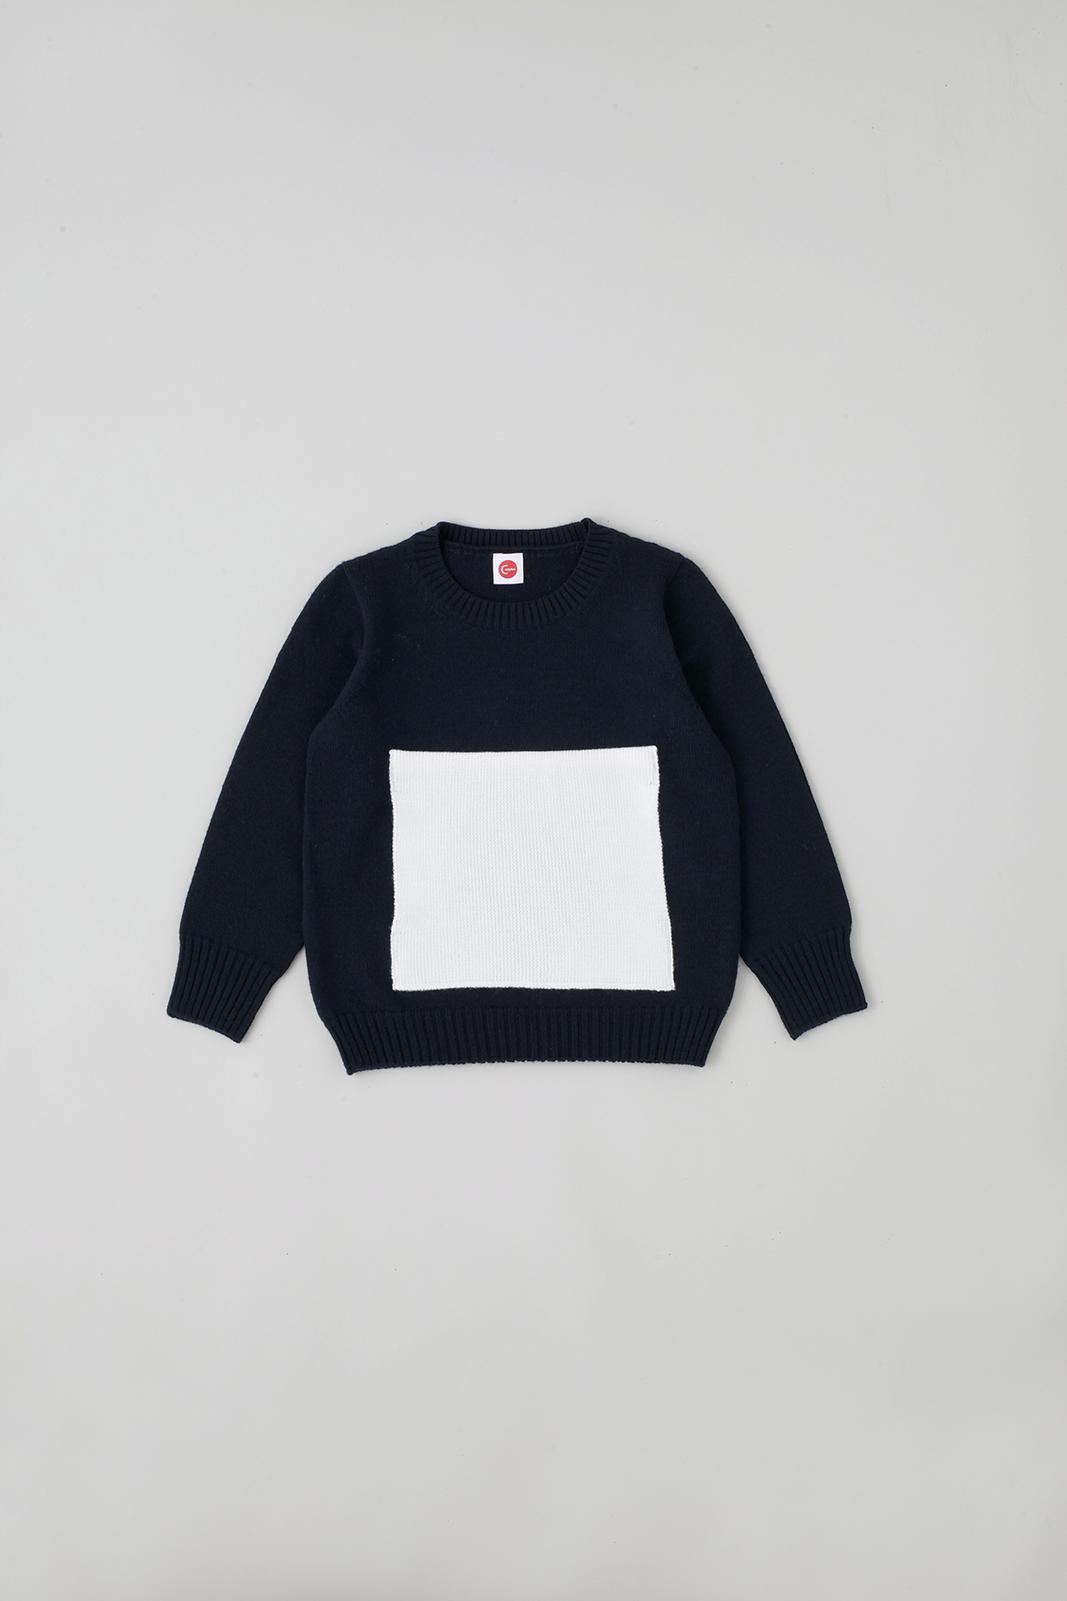 Camphor カンフル kids こども 子供服 ■sweater 日本製 madeinjapan